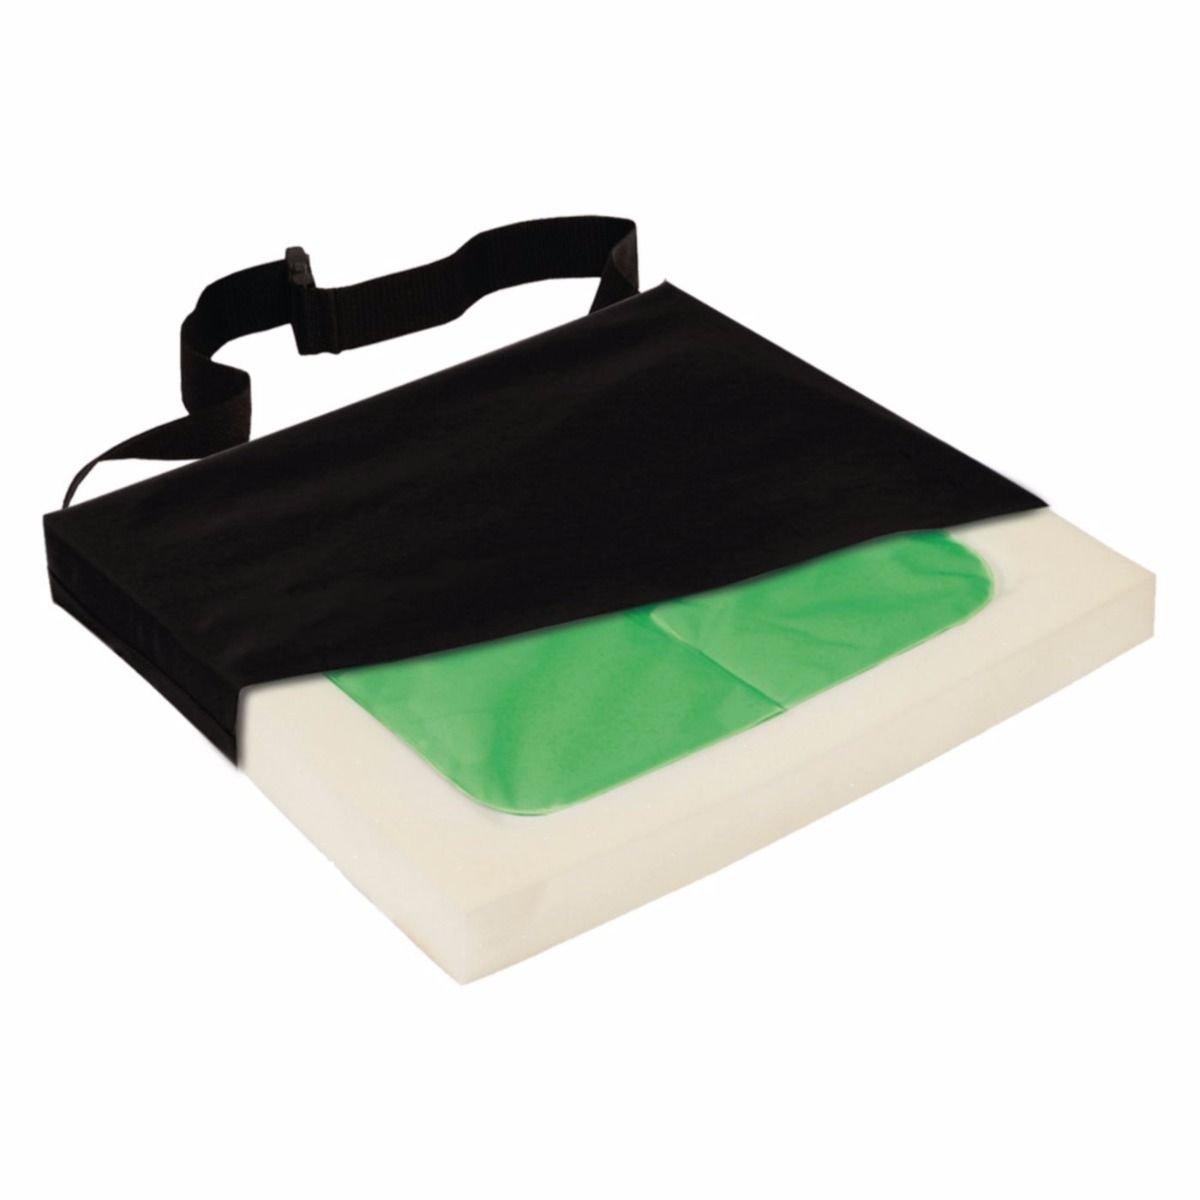 C-Gel Wheelchair Cushion, Gel Foam Cushion, 20'' x 18'' x 3''